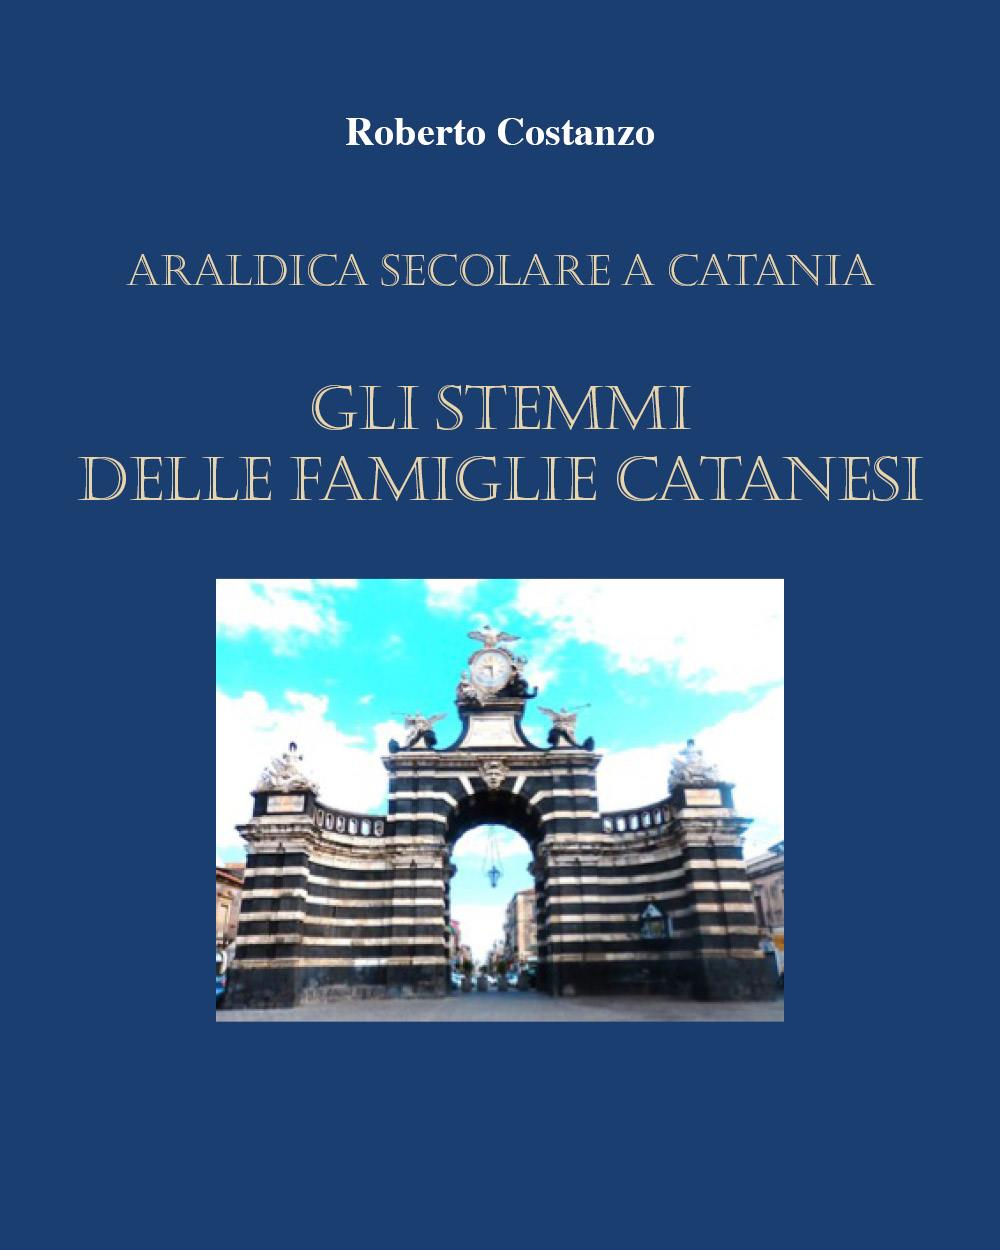 Manda araldica a Catania